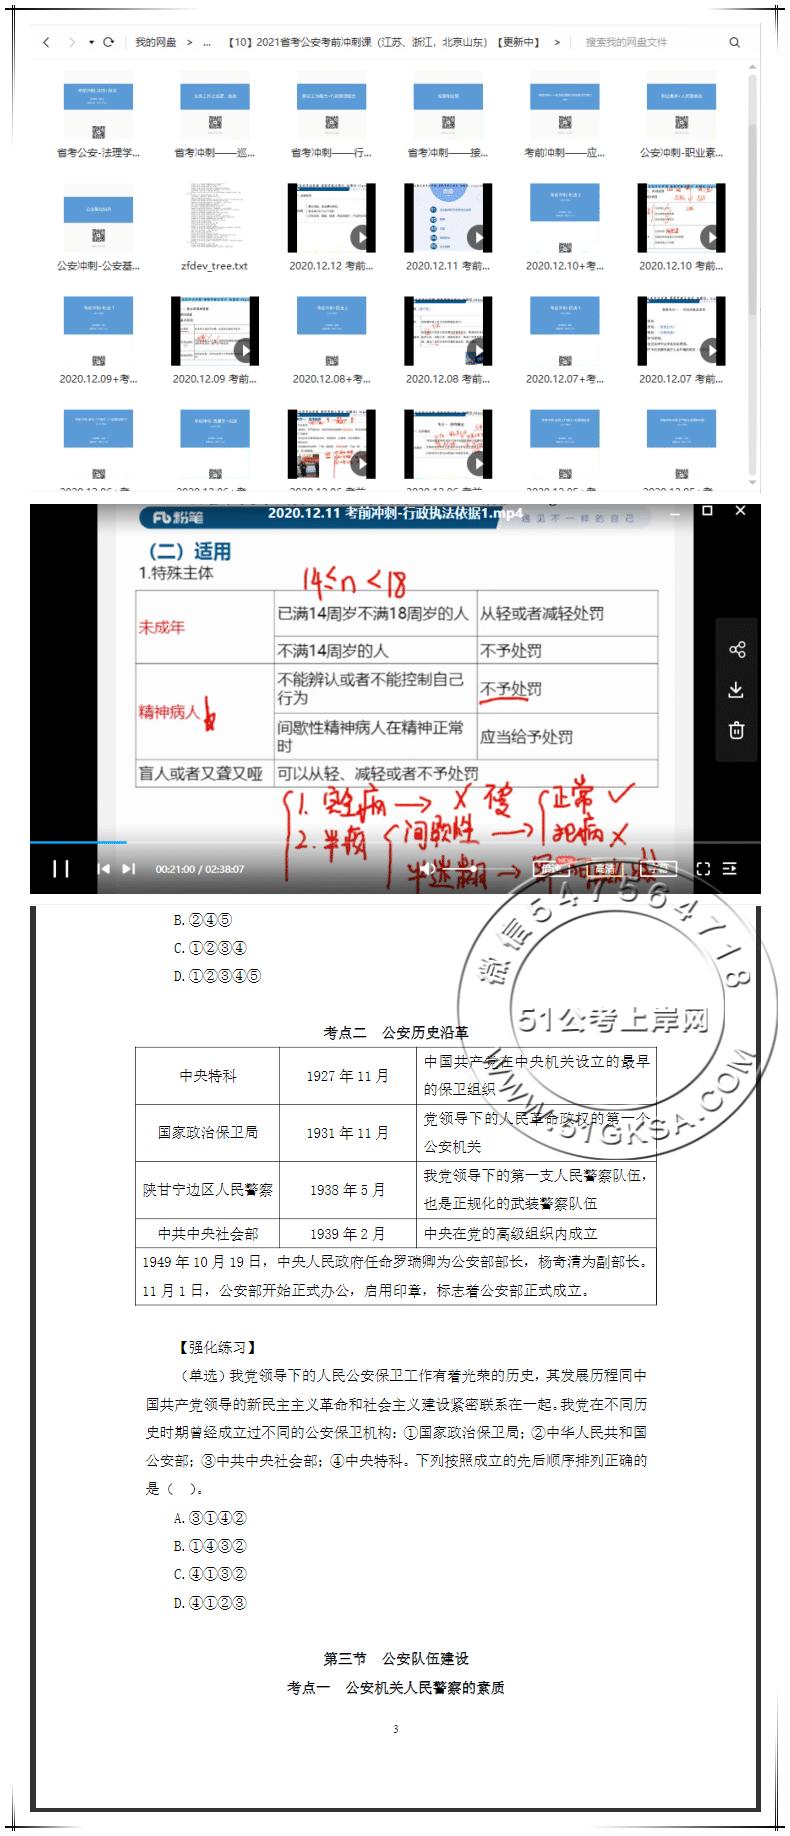 FB2021省考公安考前冲刺课(浙江、北京、江苏、山东)-51公考上岸网